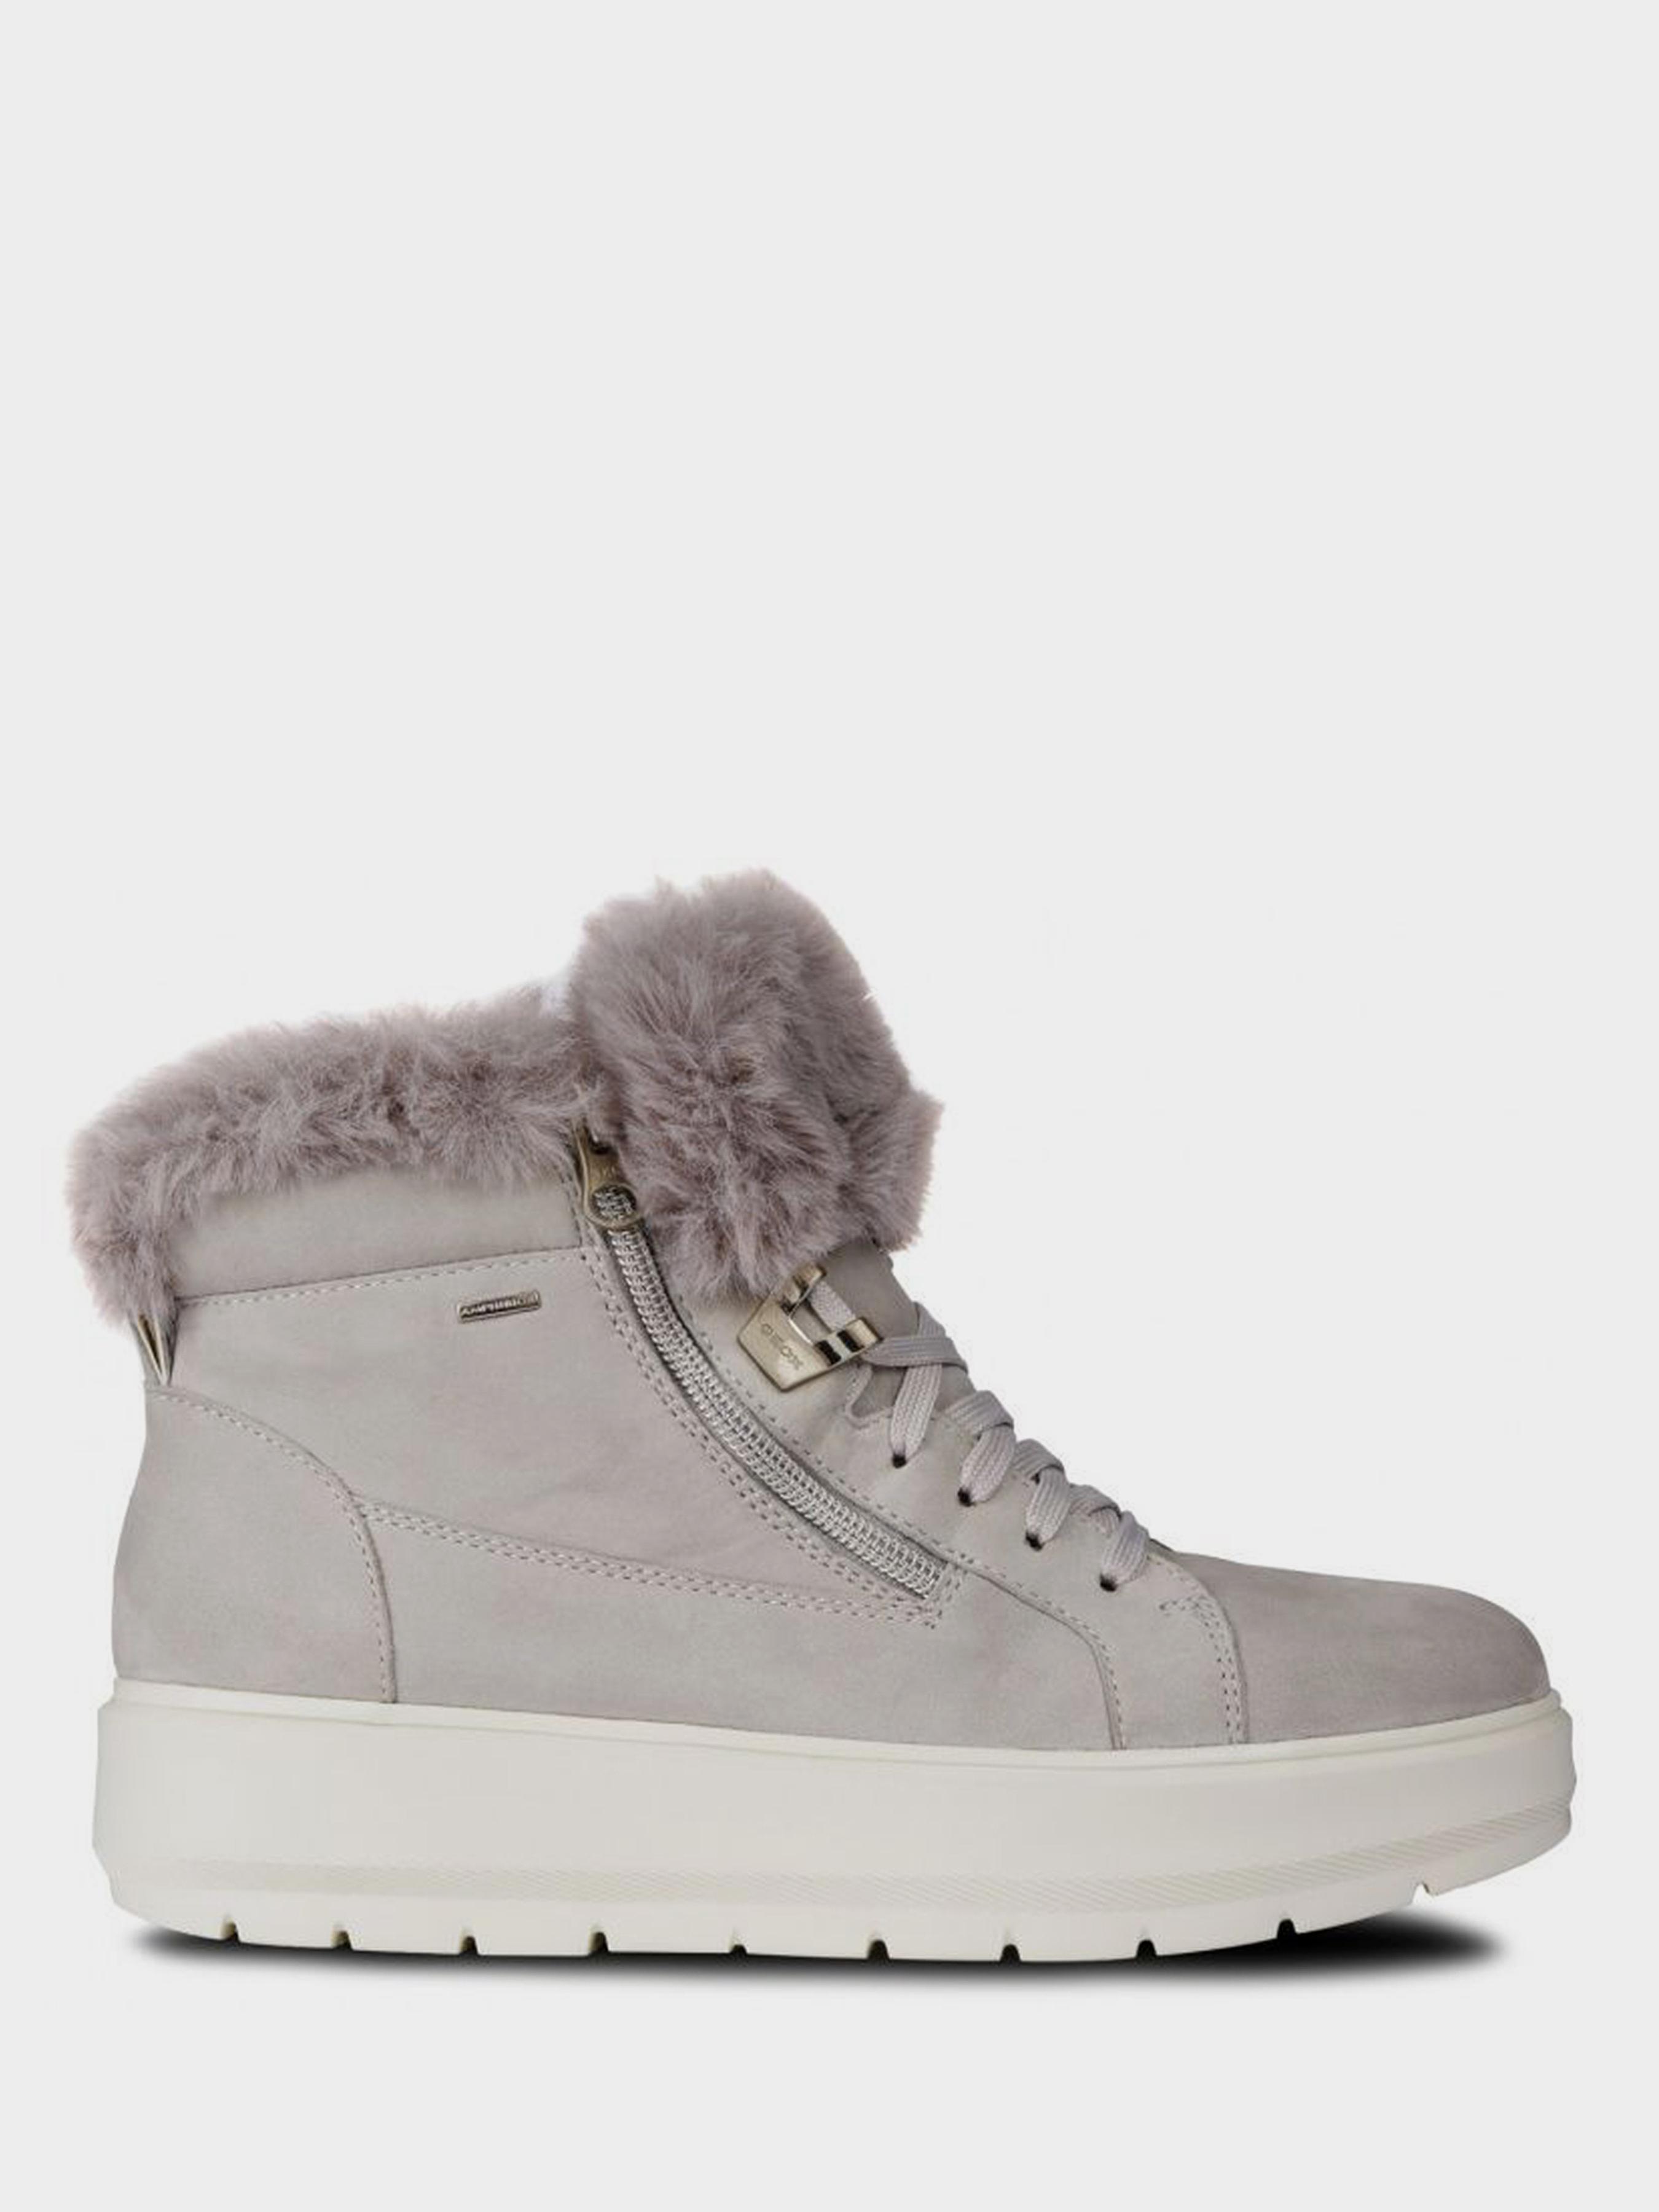 Купить Ботинки женские Geox KAULA ABX XW3385, Серый